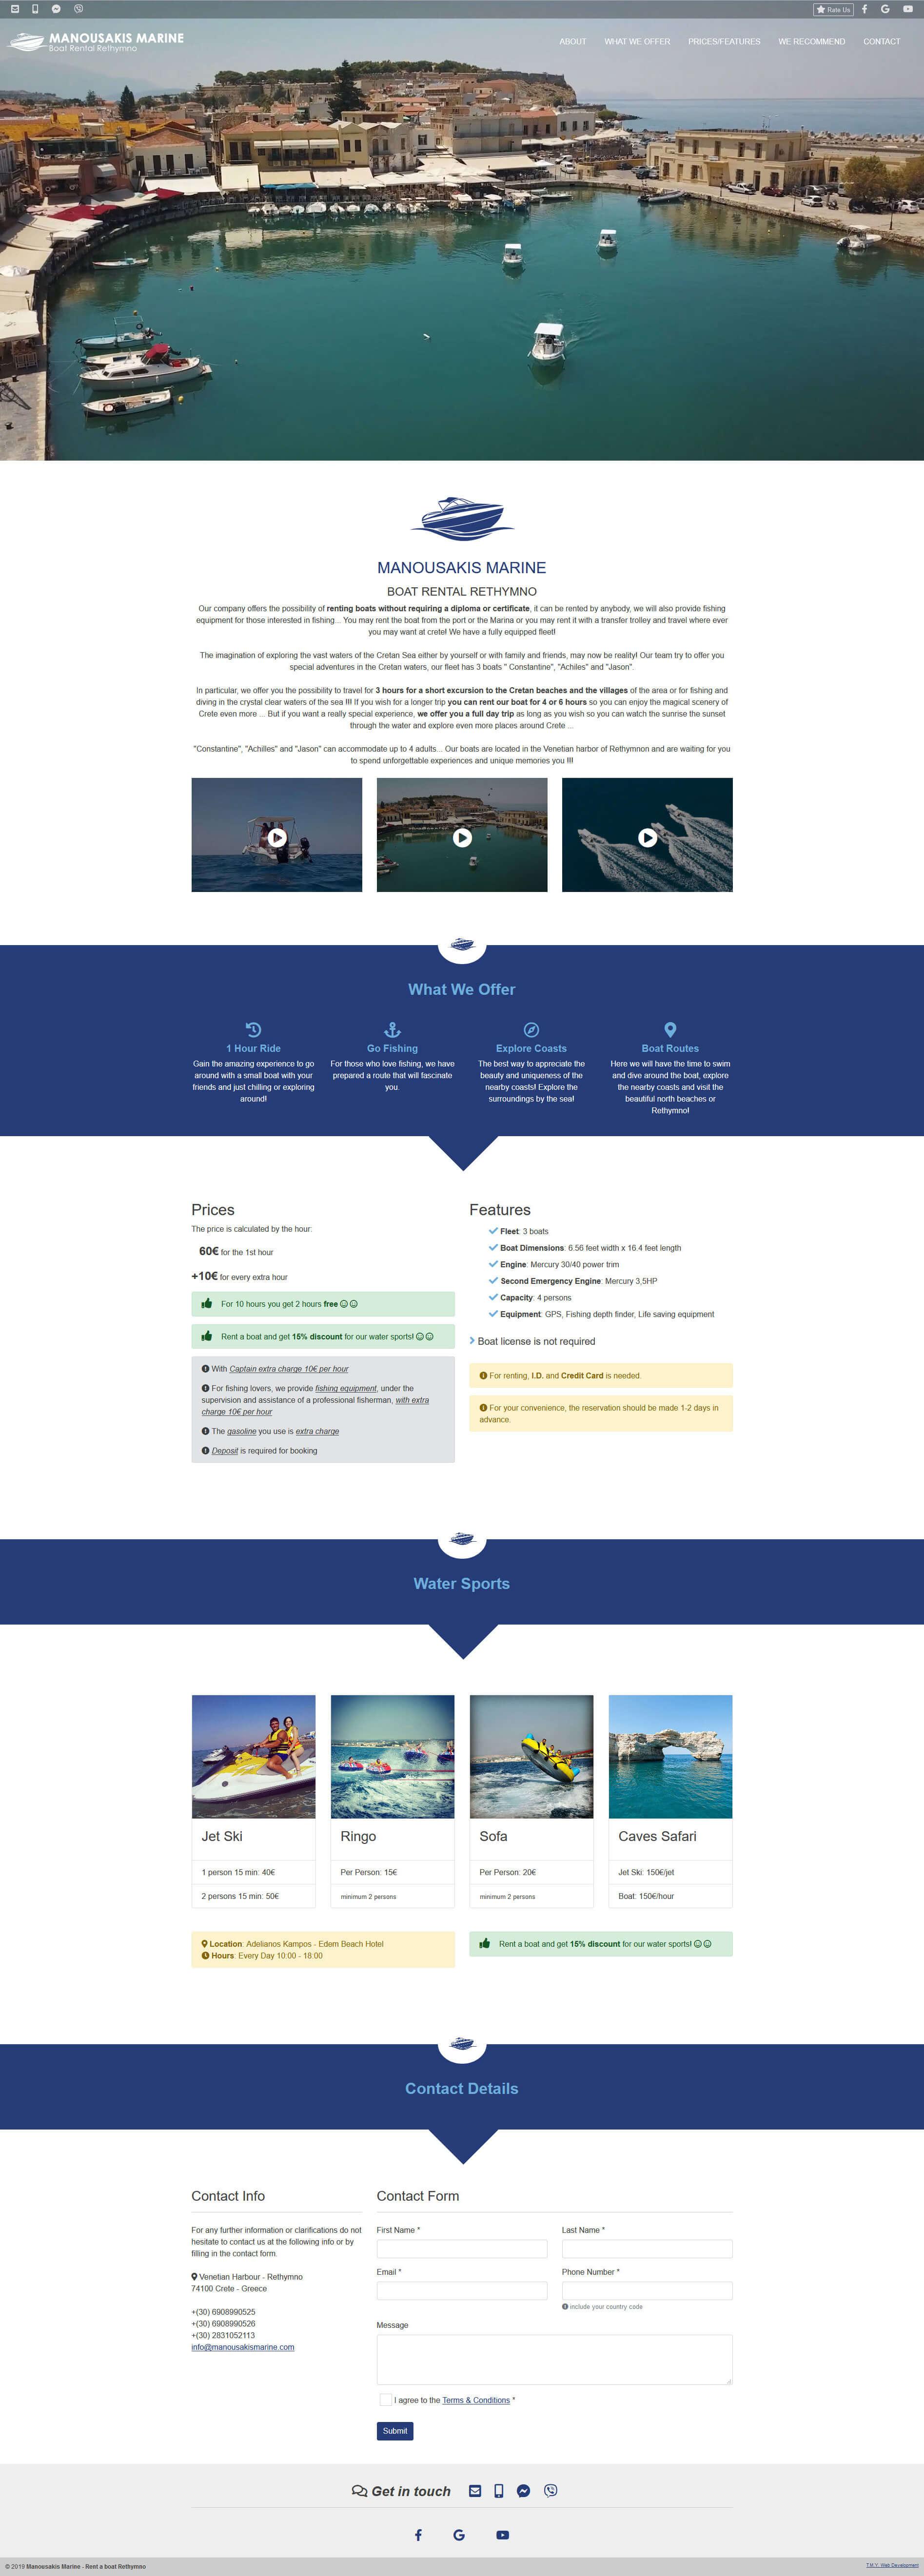 T.M.Y. Ιστοσελίδες - manousakismarinecom